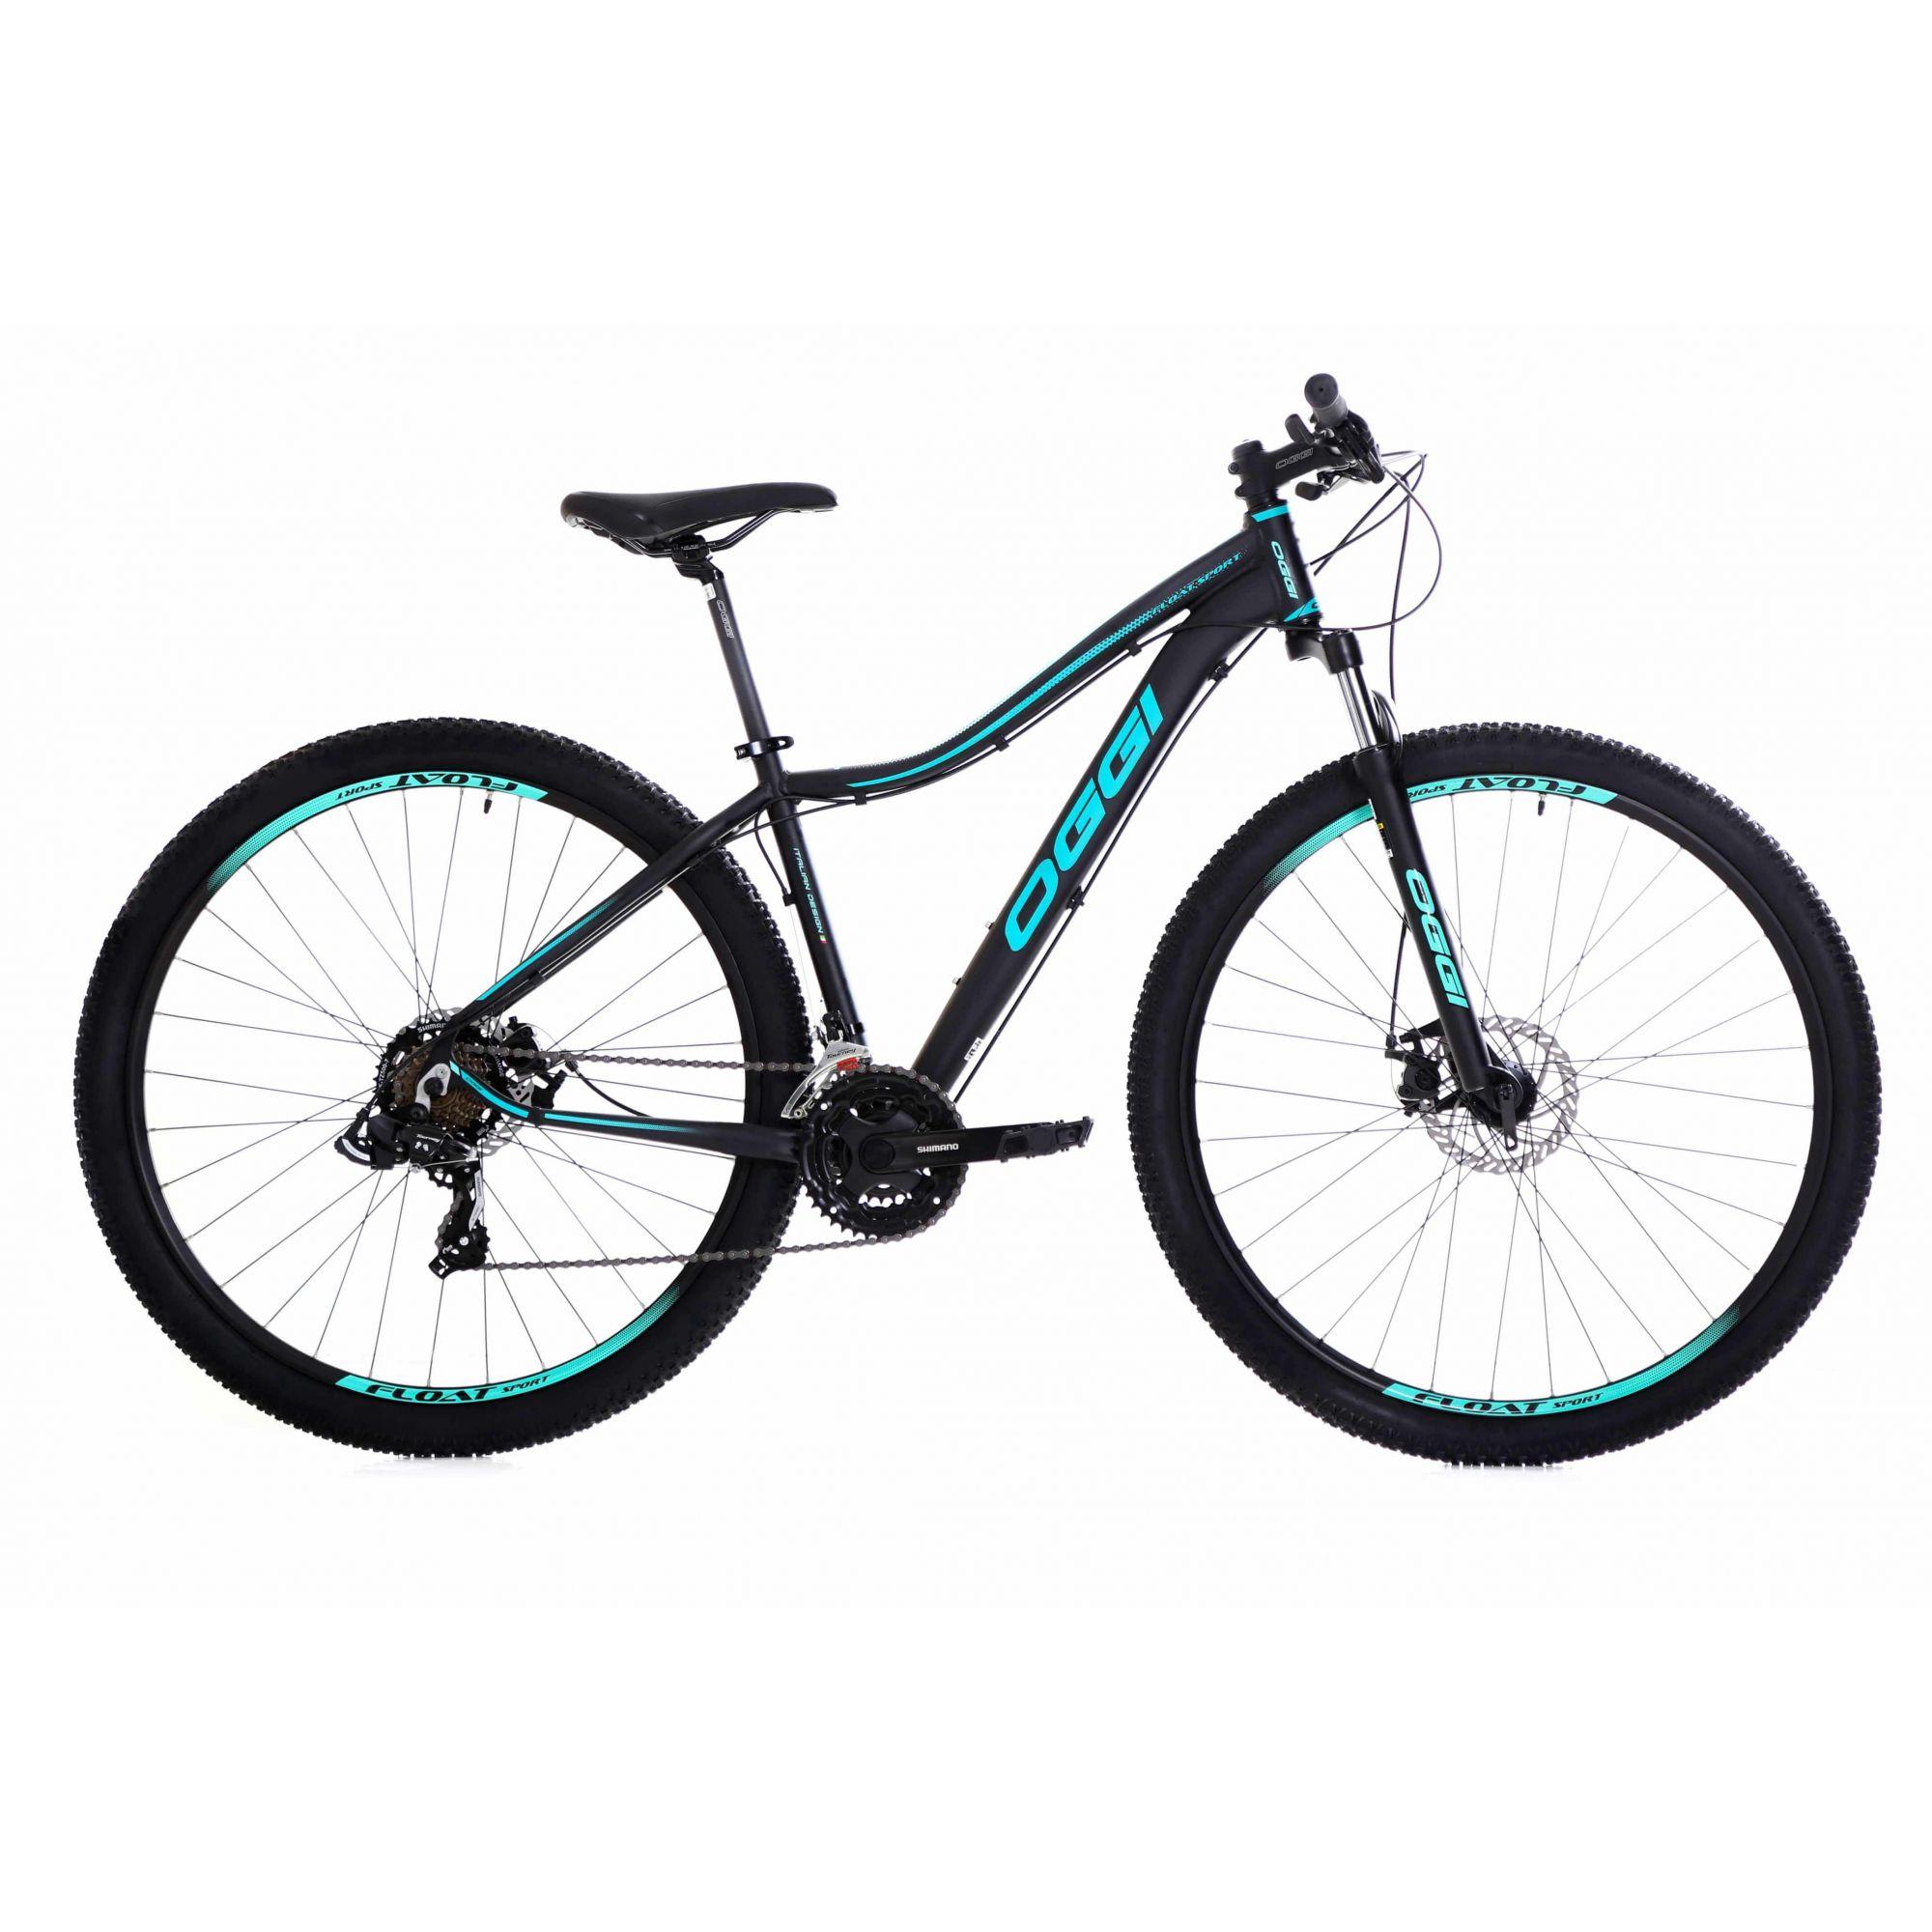 3a39d30ec 2018 - Cicle Ponta Bikes BICICLETA 29 FEMININA FLOAT SPORT 21VEL.-2018 -  Cicle Ponta Bikes